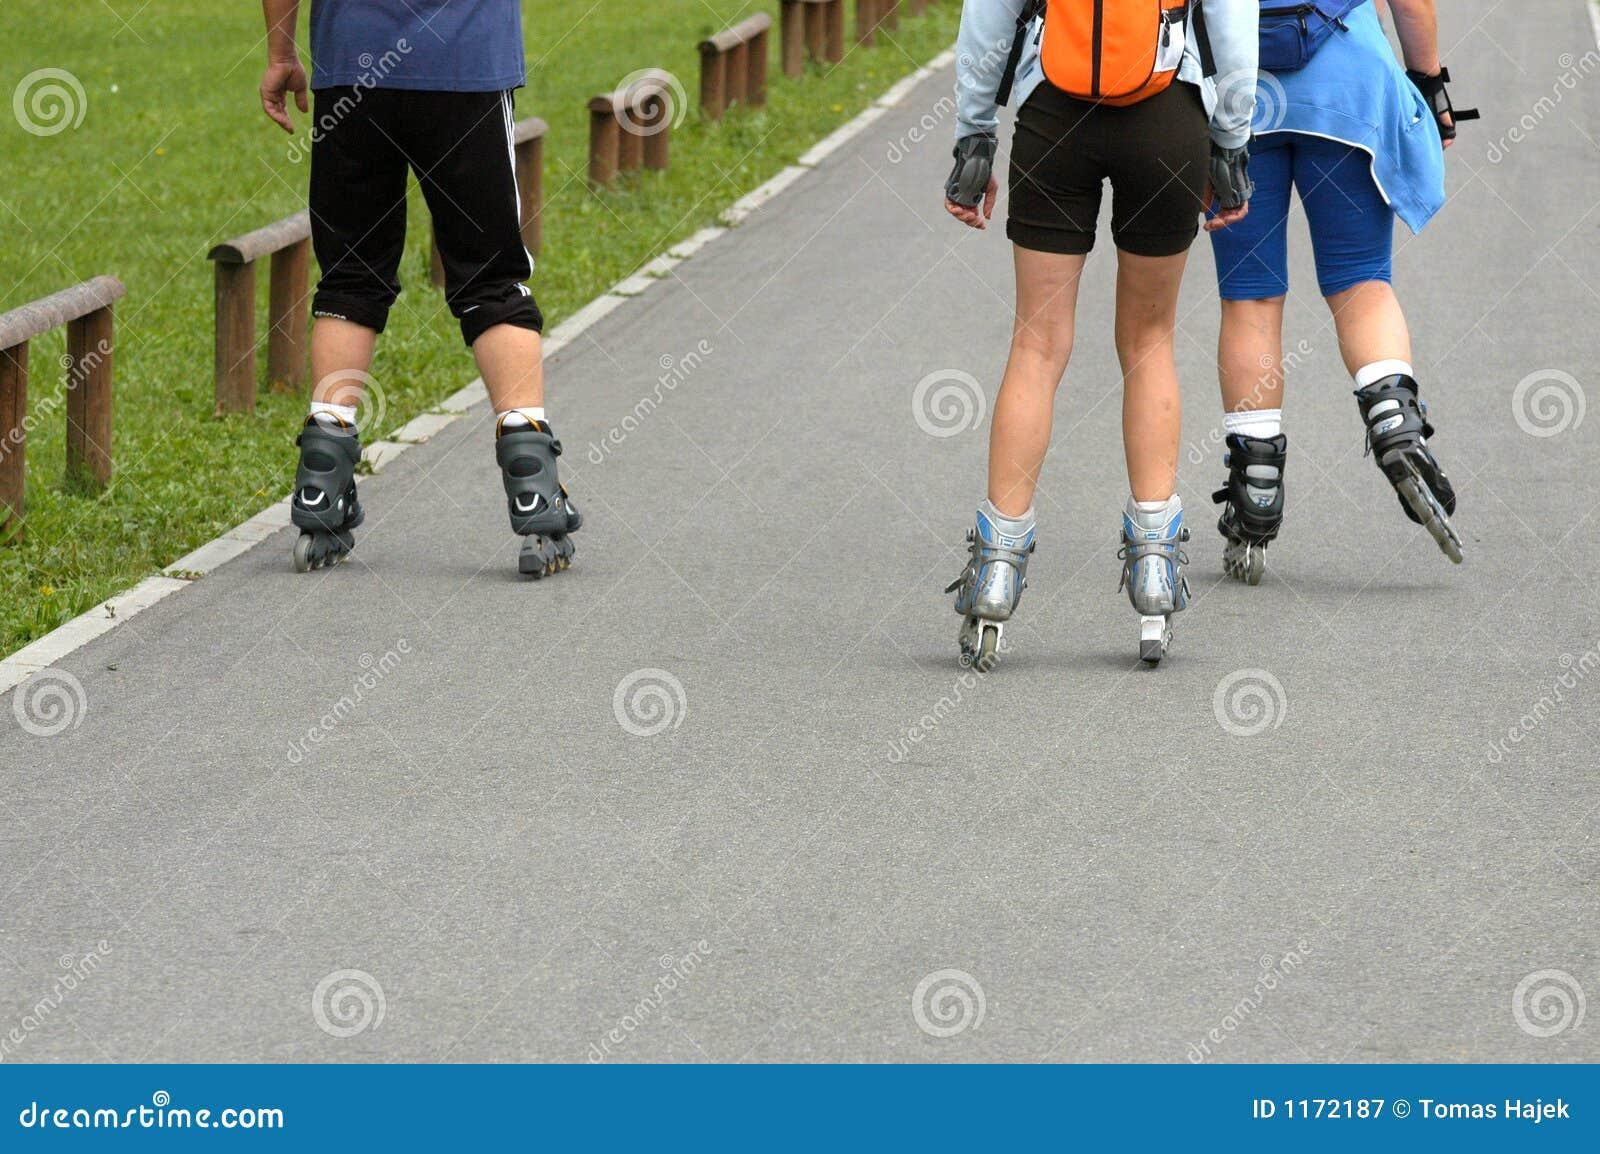 Roller skates for free - Roller Skates Royalty Free Stock Photography